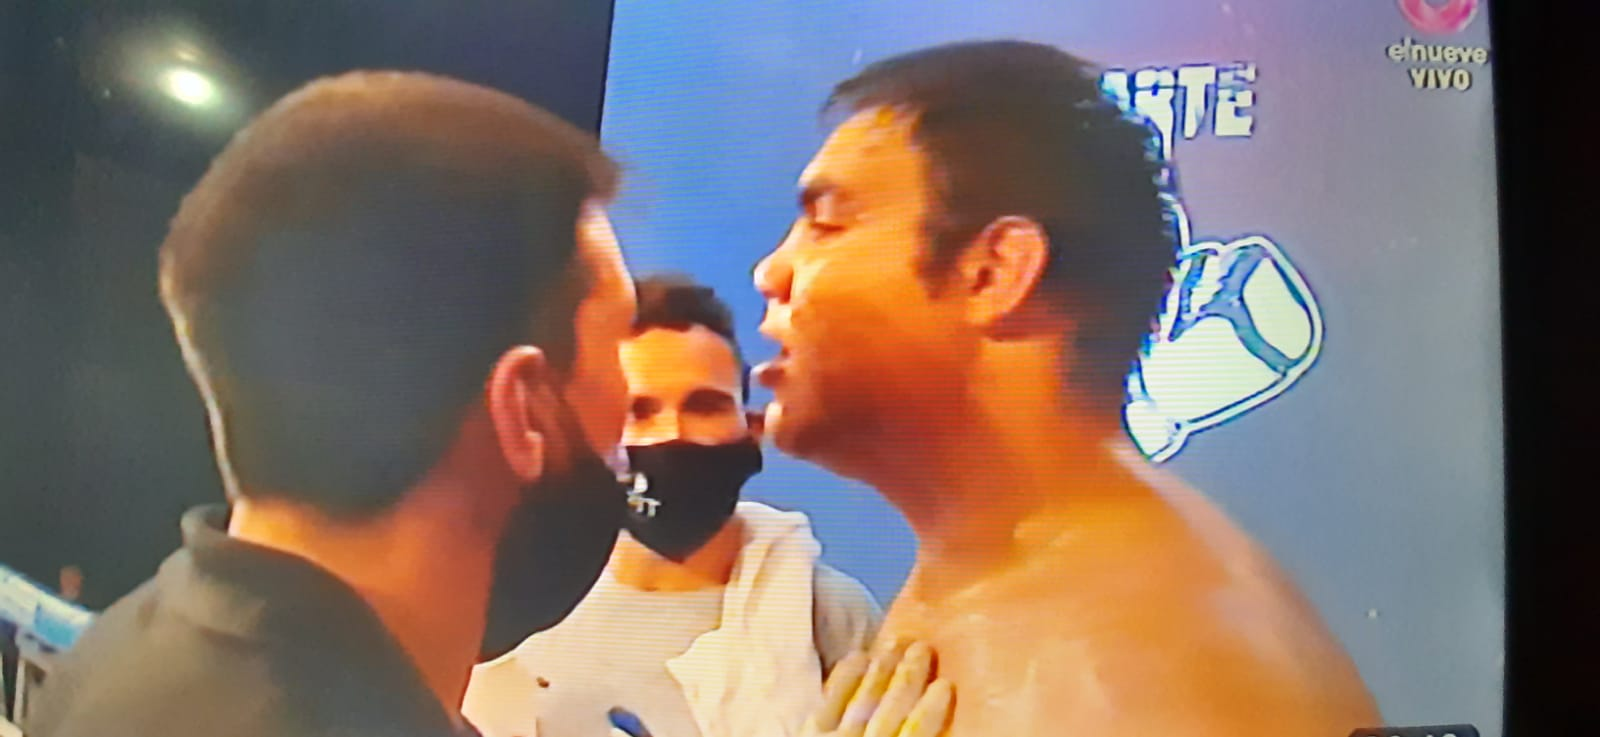 En este momento estás viendo Knockout 9 : derrota por puntos de Kevin Espíndola ante Jorge Arias